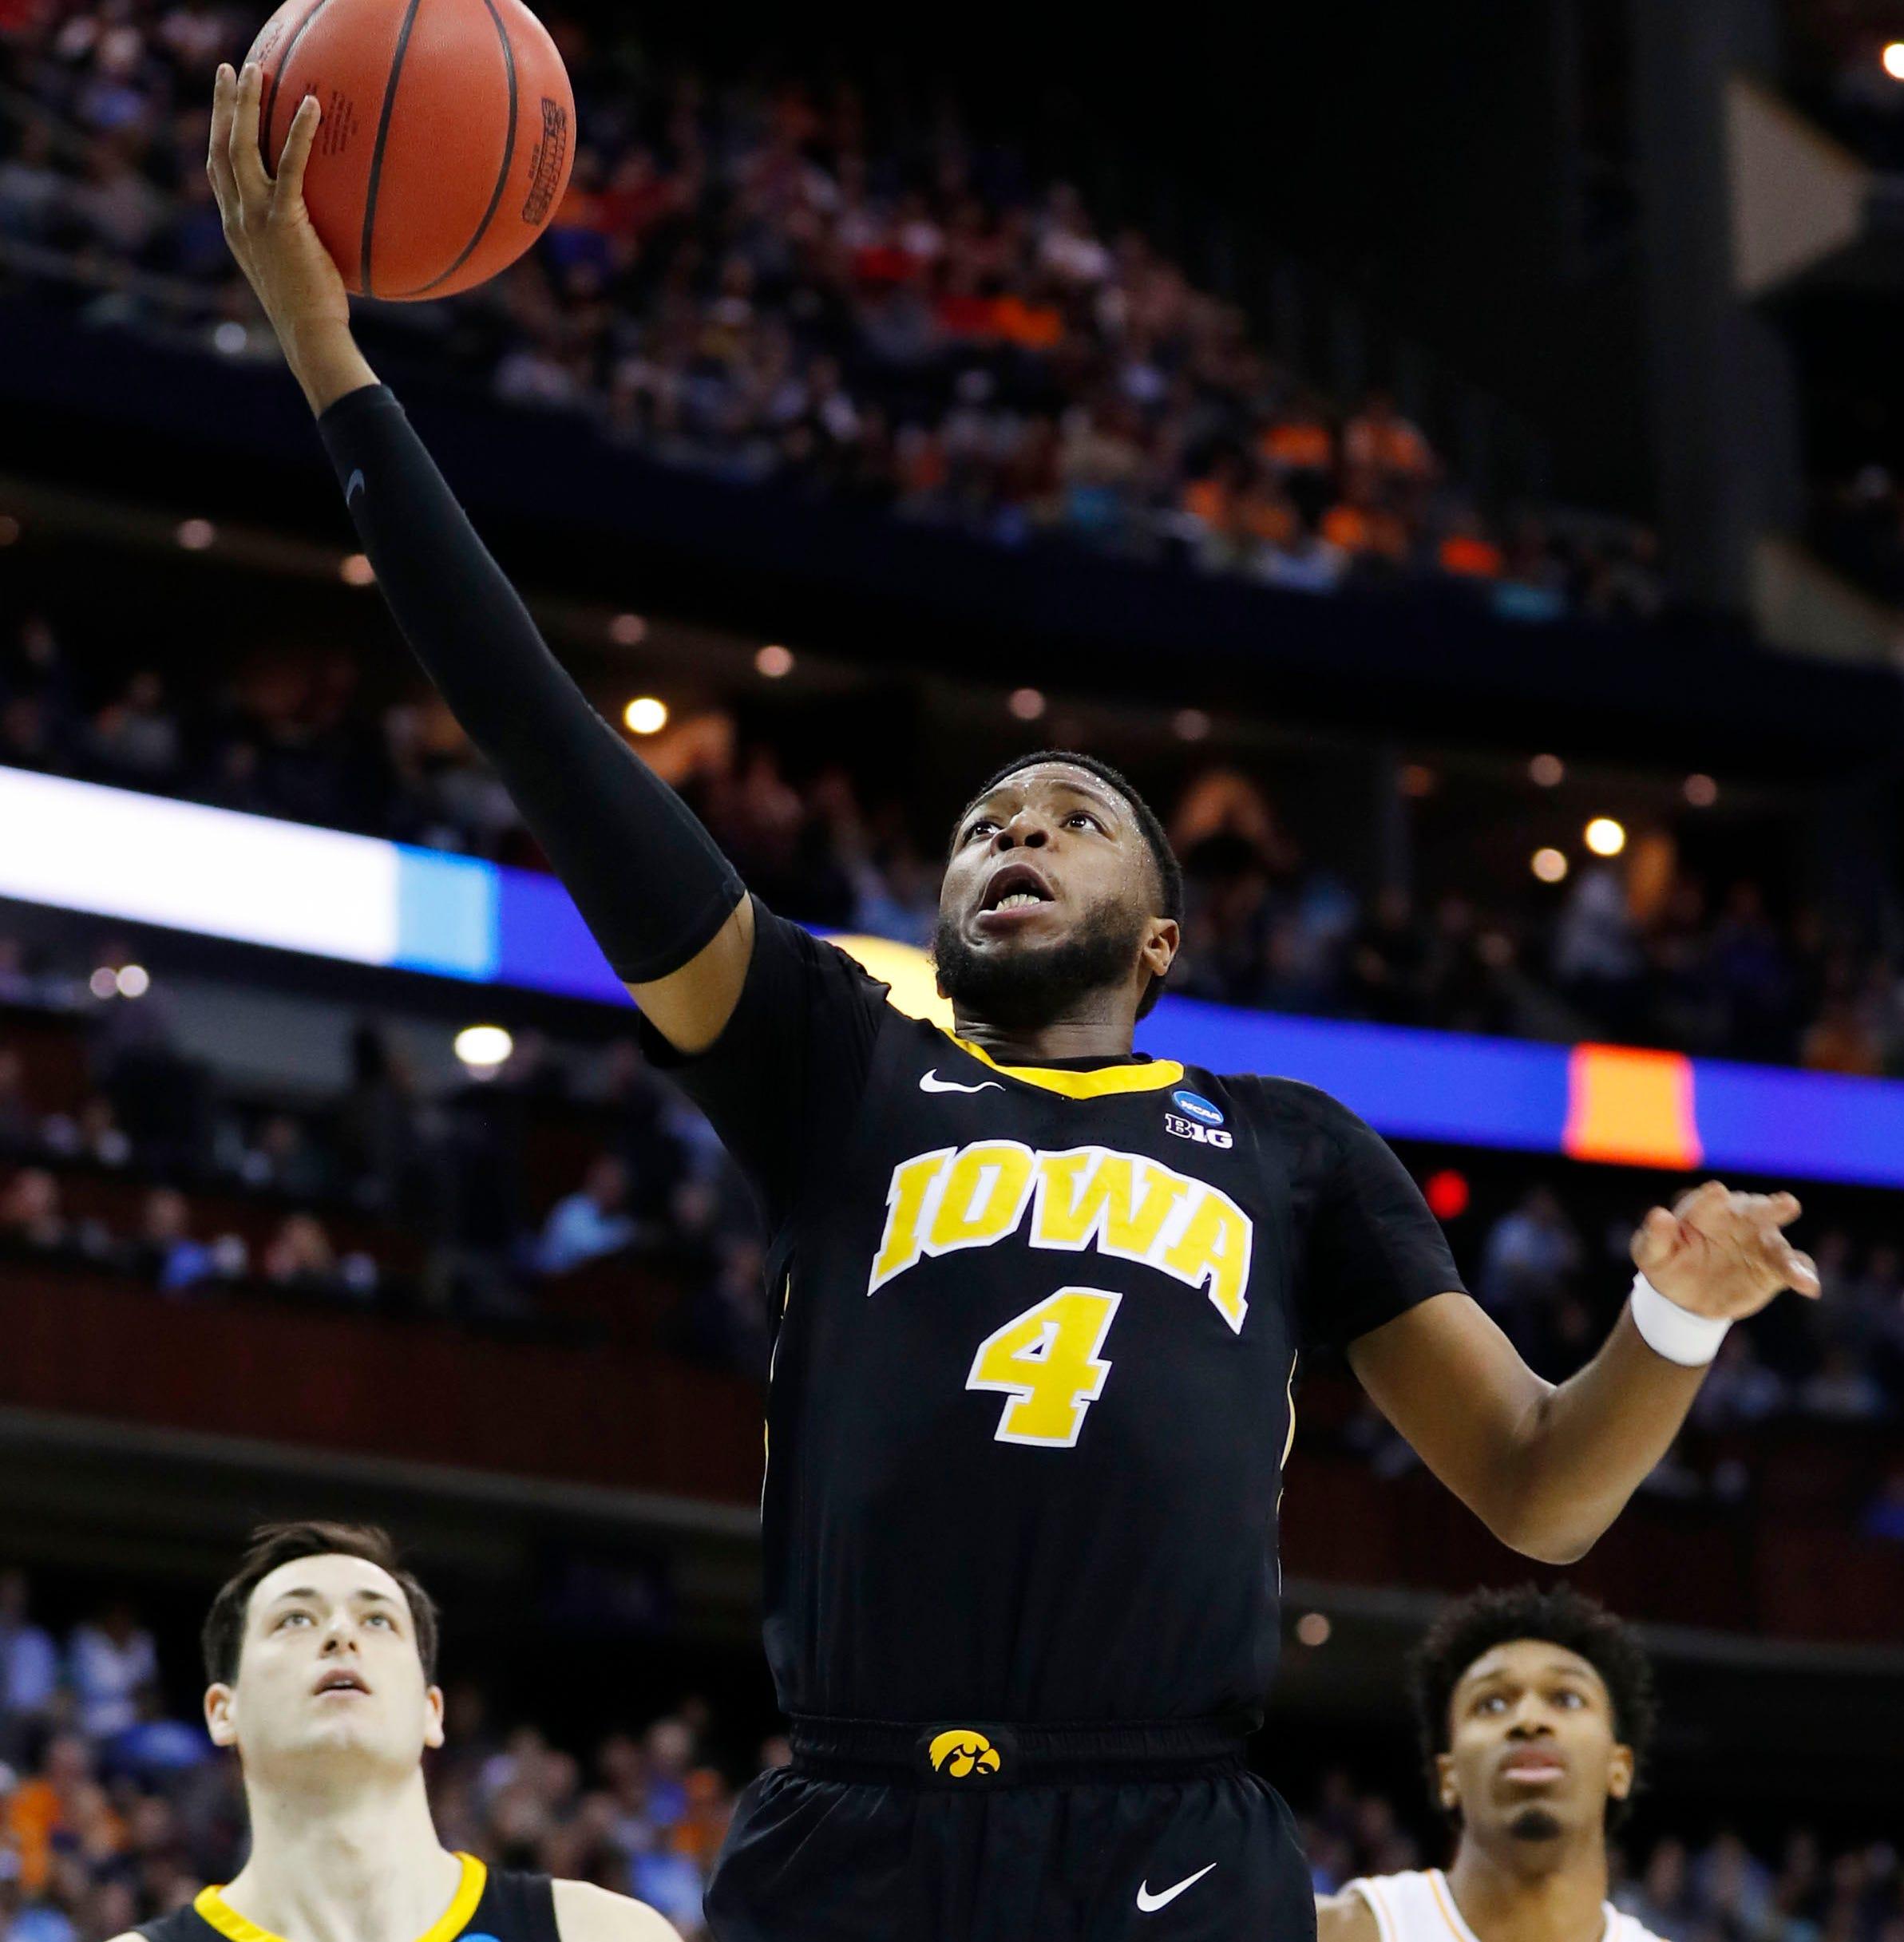 Isaiah Moss will transfer from Iowa Hawkeye basketball team